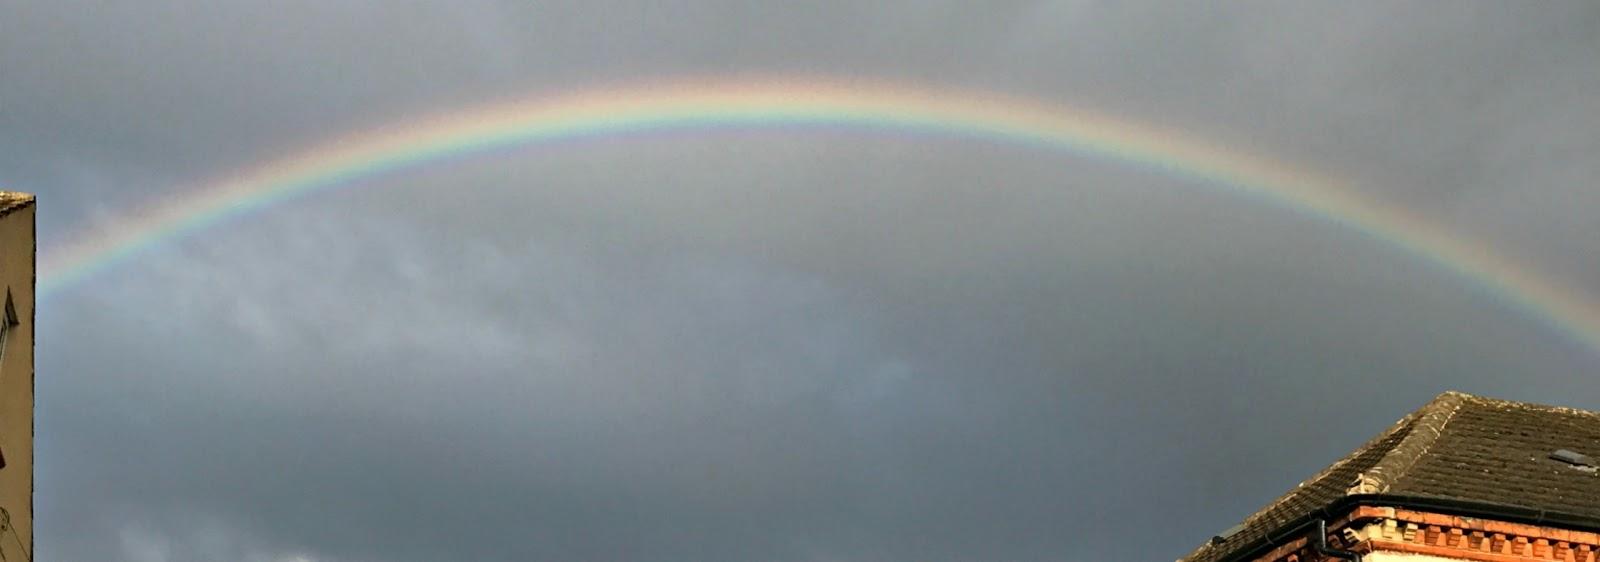 rainbow-overhead